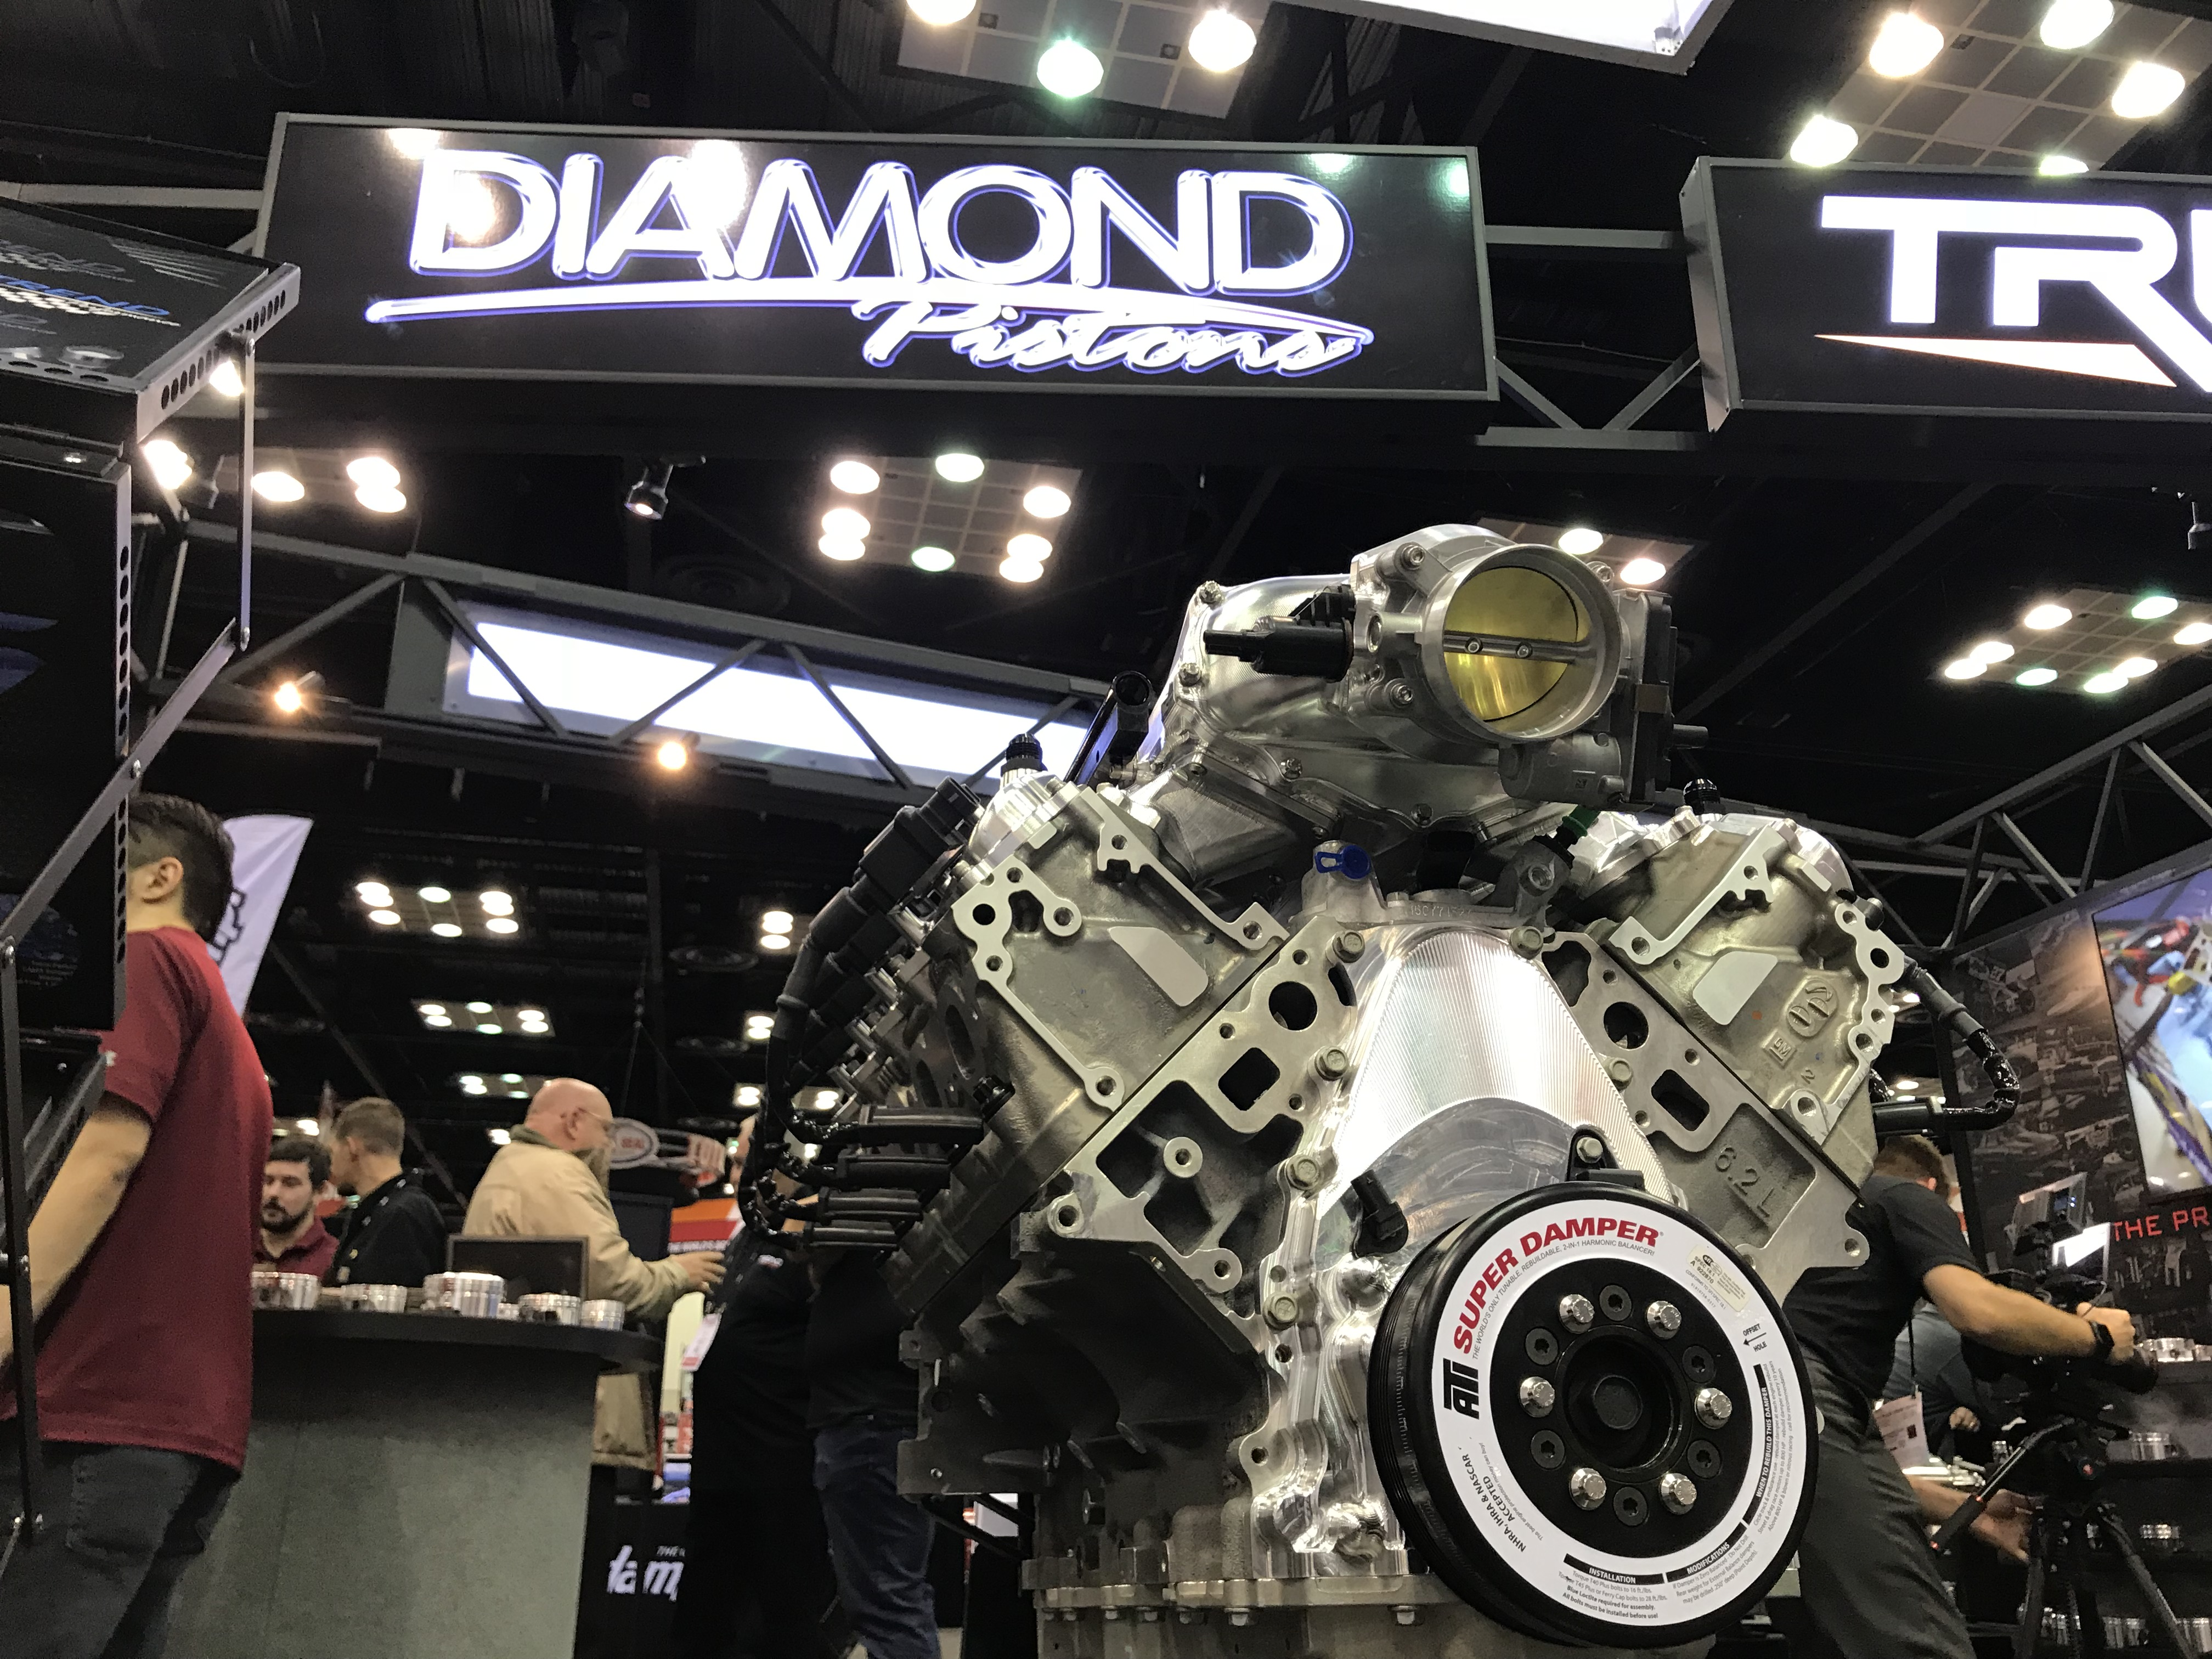 Visit Diamond Pistons At The 2017 PRI Show Booth 1825